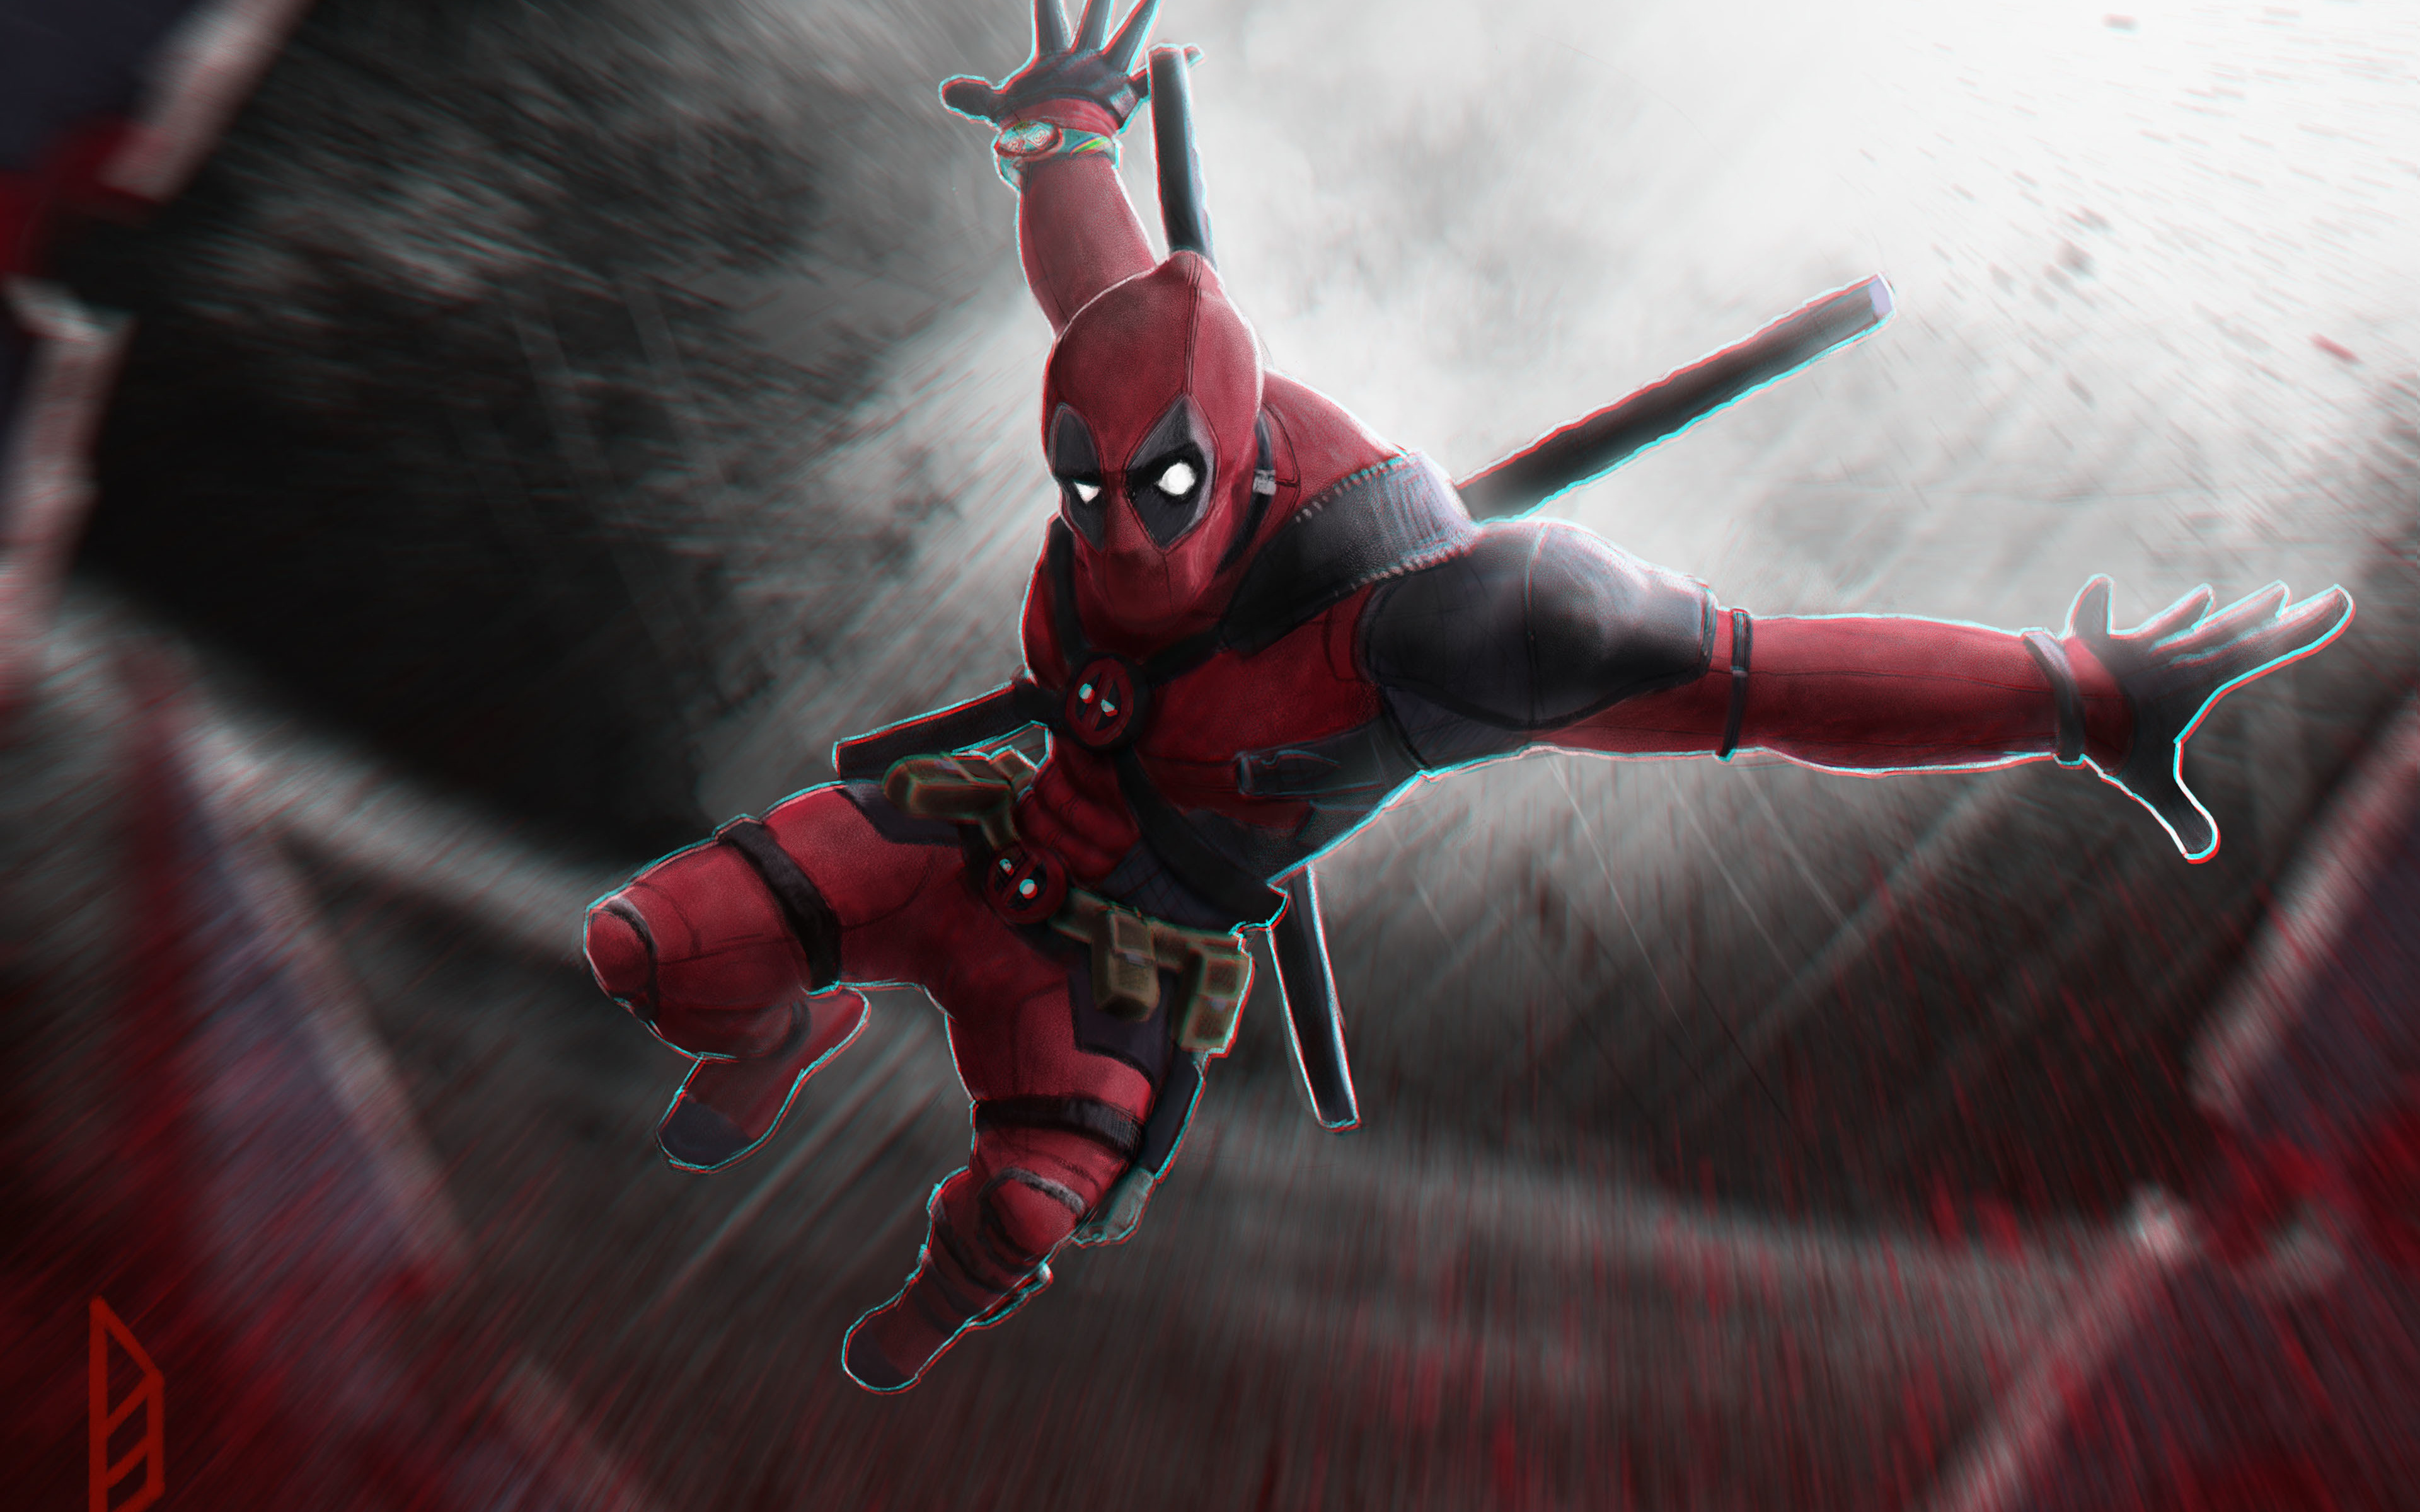 Deadpool Superhero Marvel Art Wallpaper Ultra Hd Deadpool Wallpaper 4k 3840x2400 Wallpaper Teahub Io